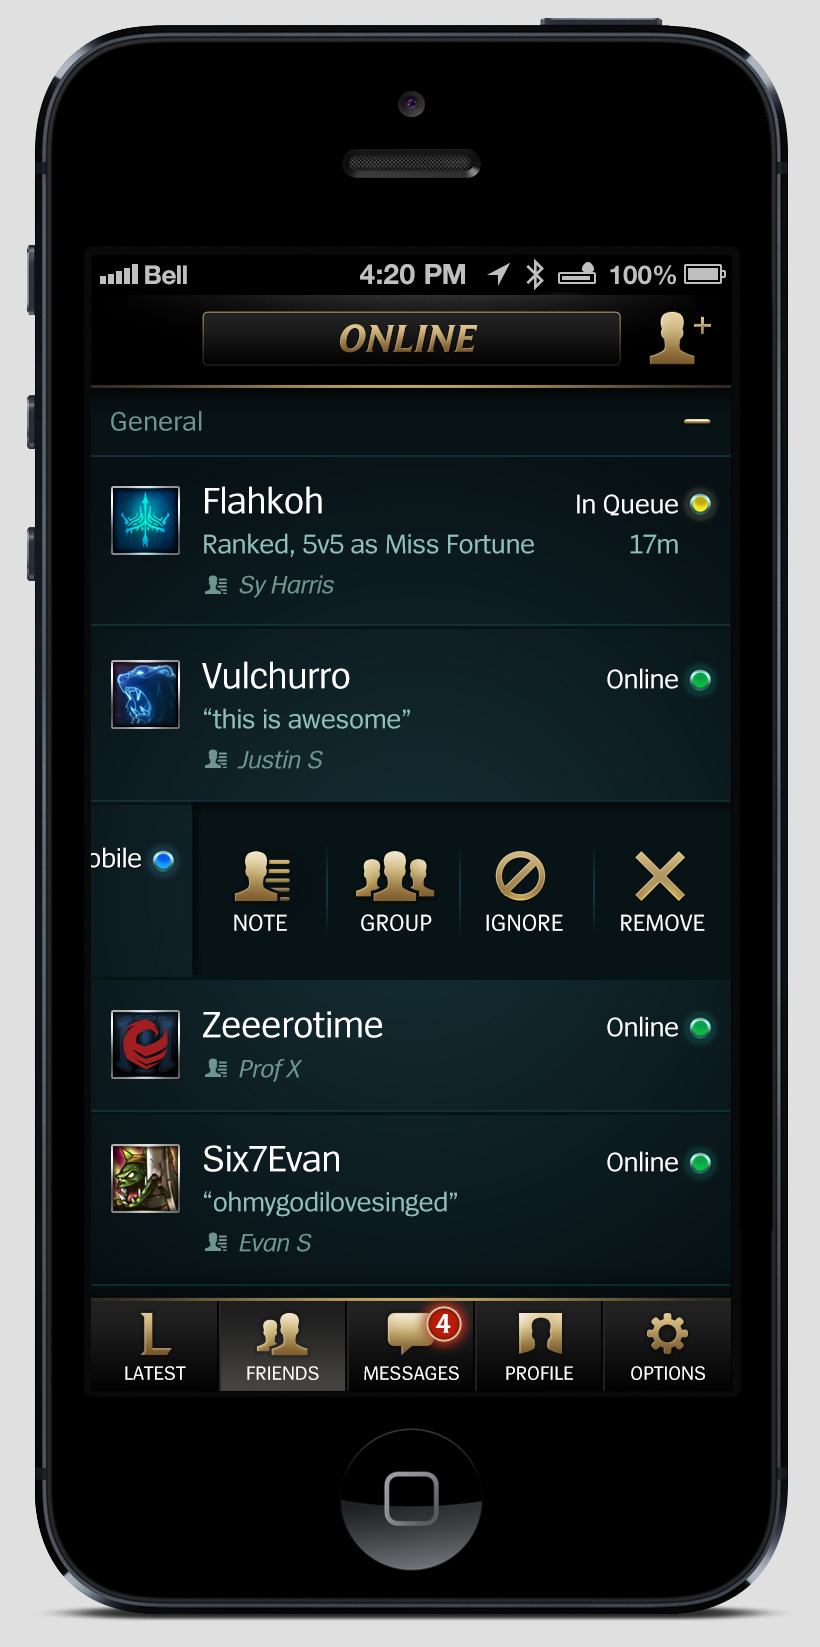 mobile_companion_15_friendsOptions.jpg